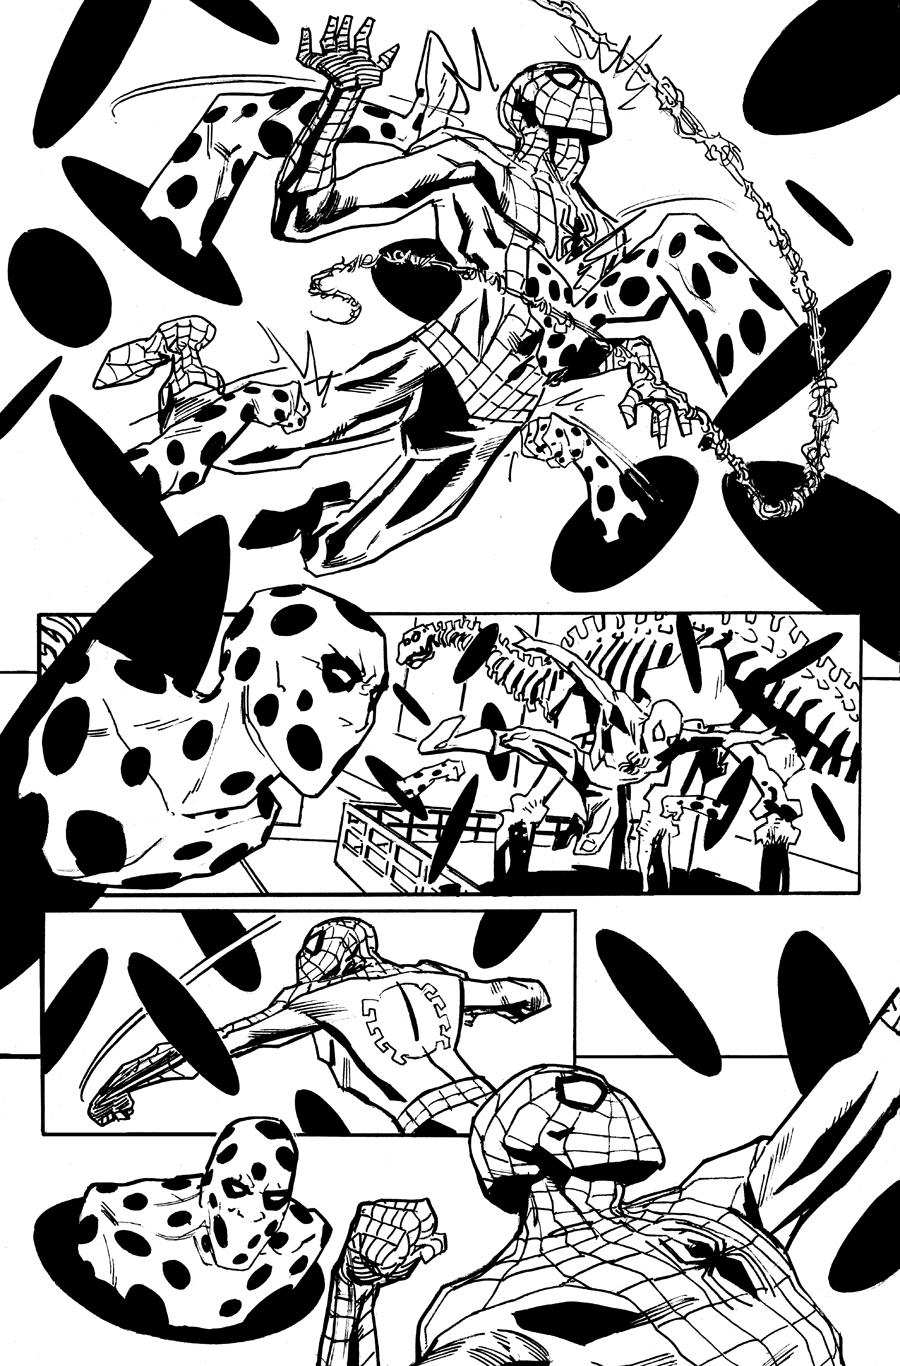 900x1366 Spider Man And The Spot Portfolio Pages Dean Kotz